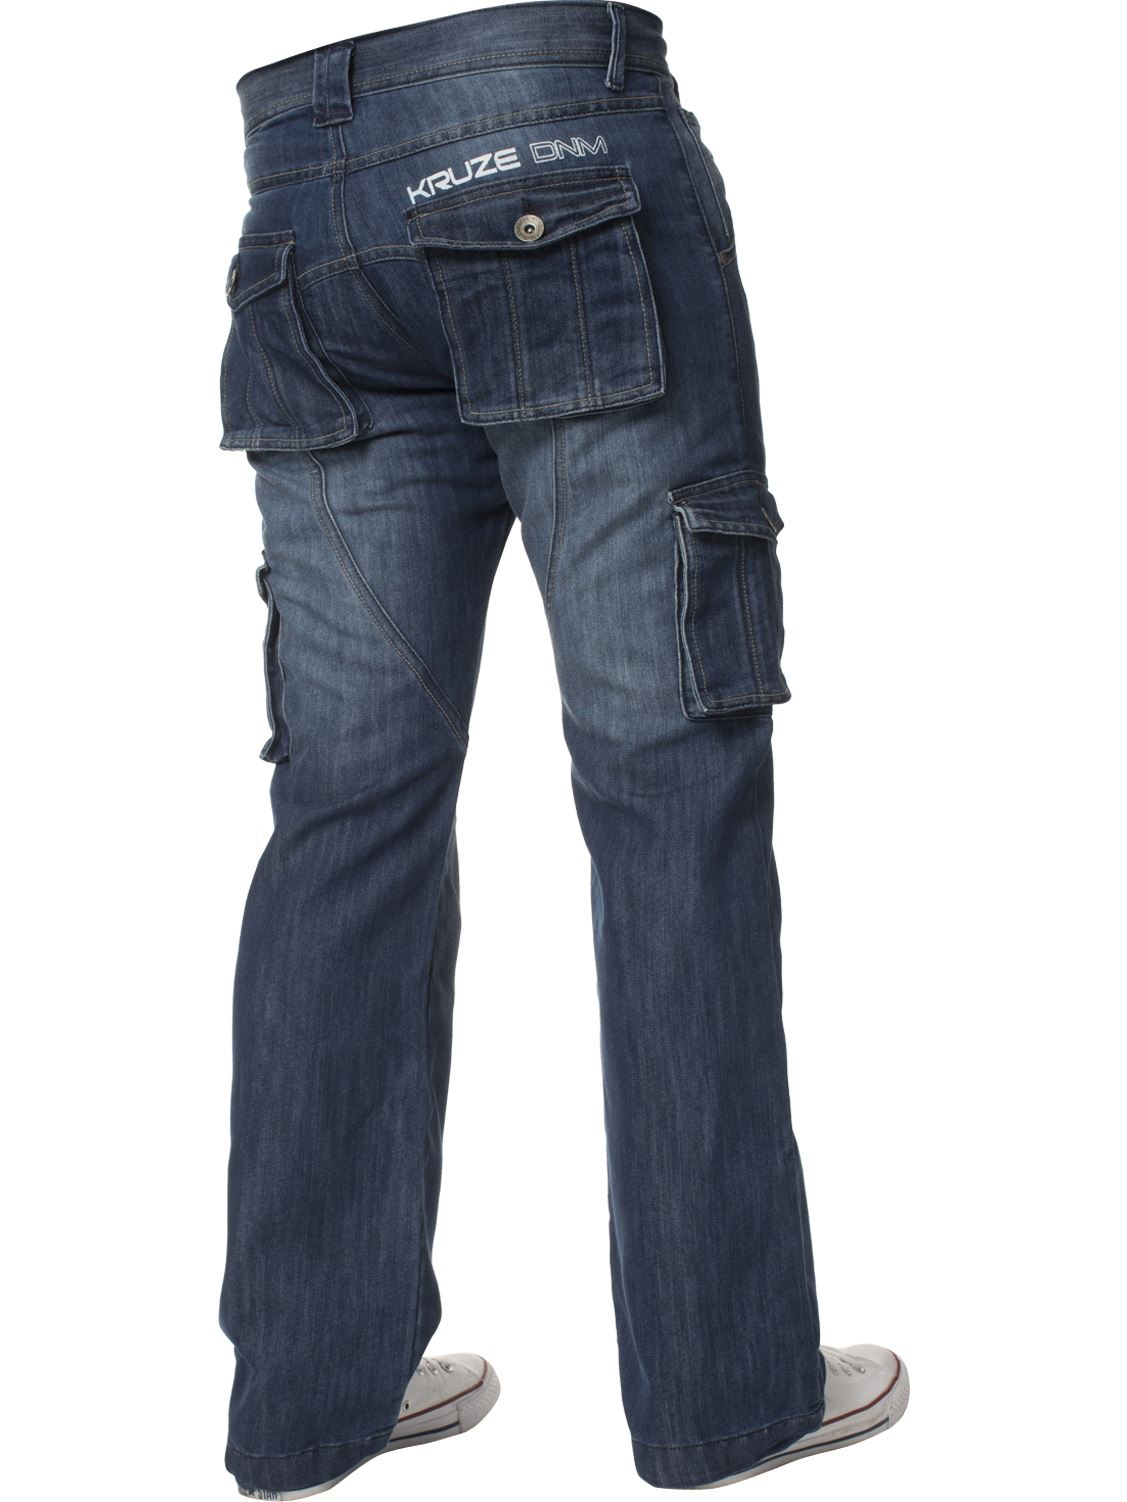 Grandes-jeans-para-hombre-de-combate-de-Kruze-Rey-Alto-Pierna-Cargo-Pantalones-Jeans-Pantalones miniatura 7